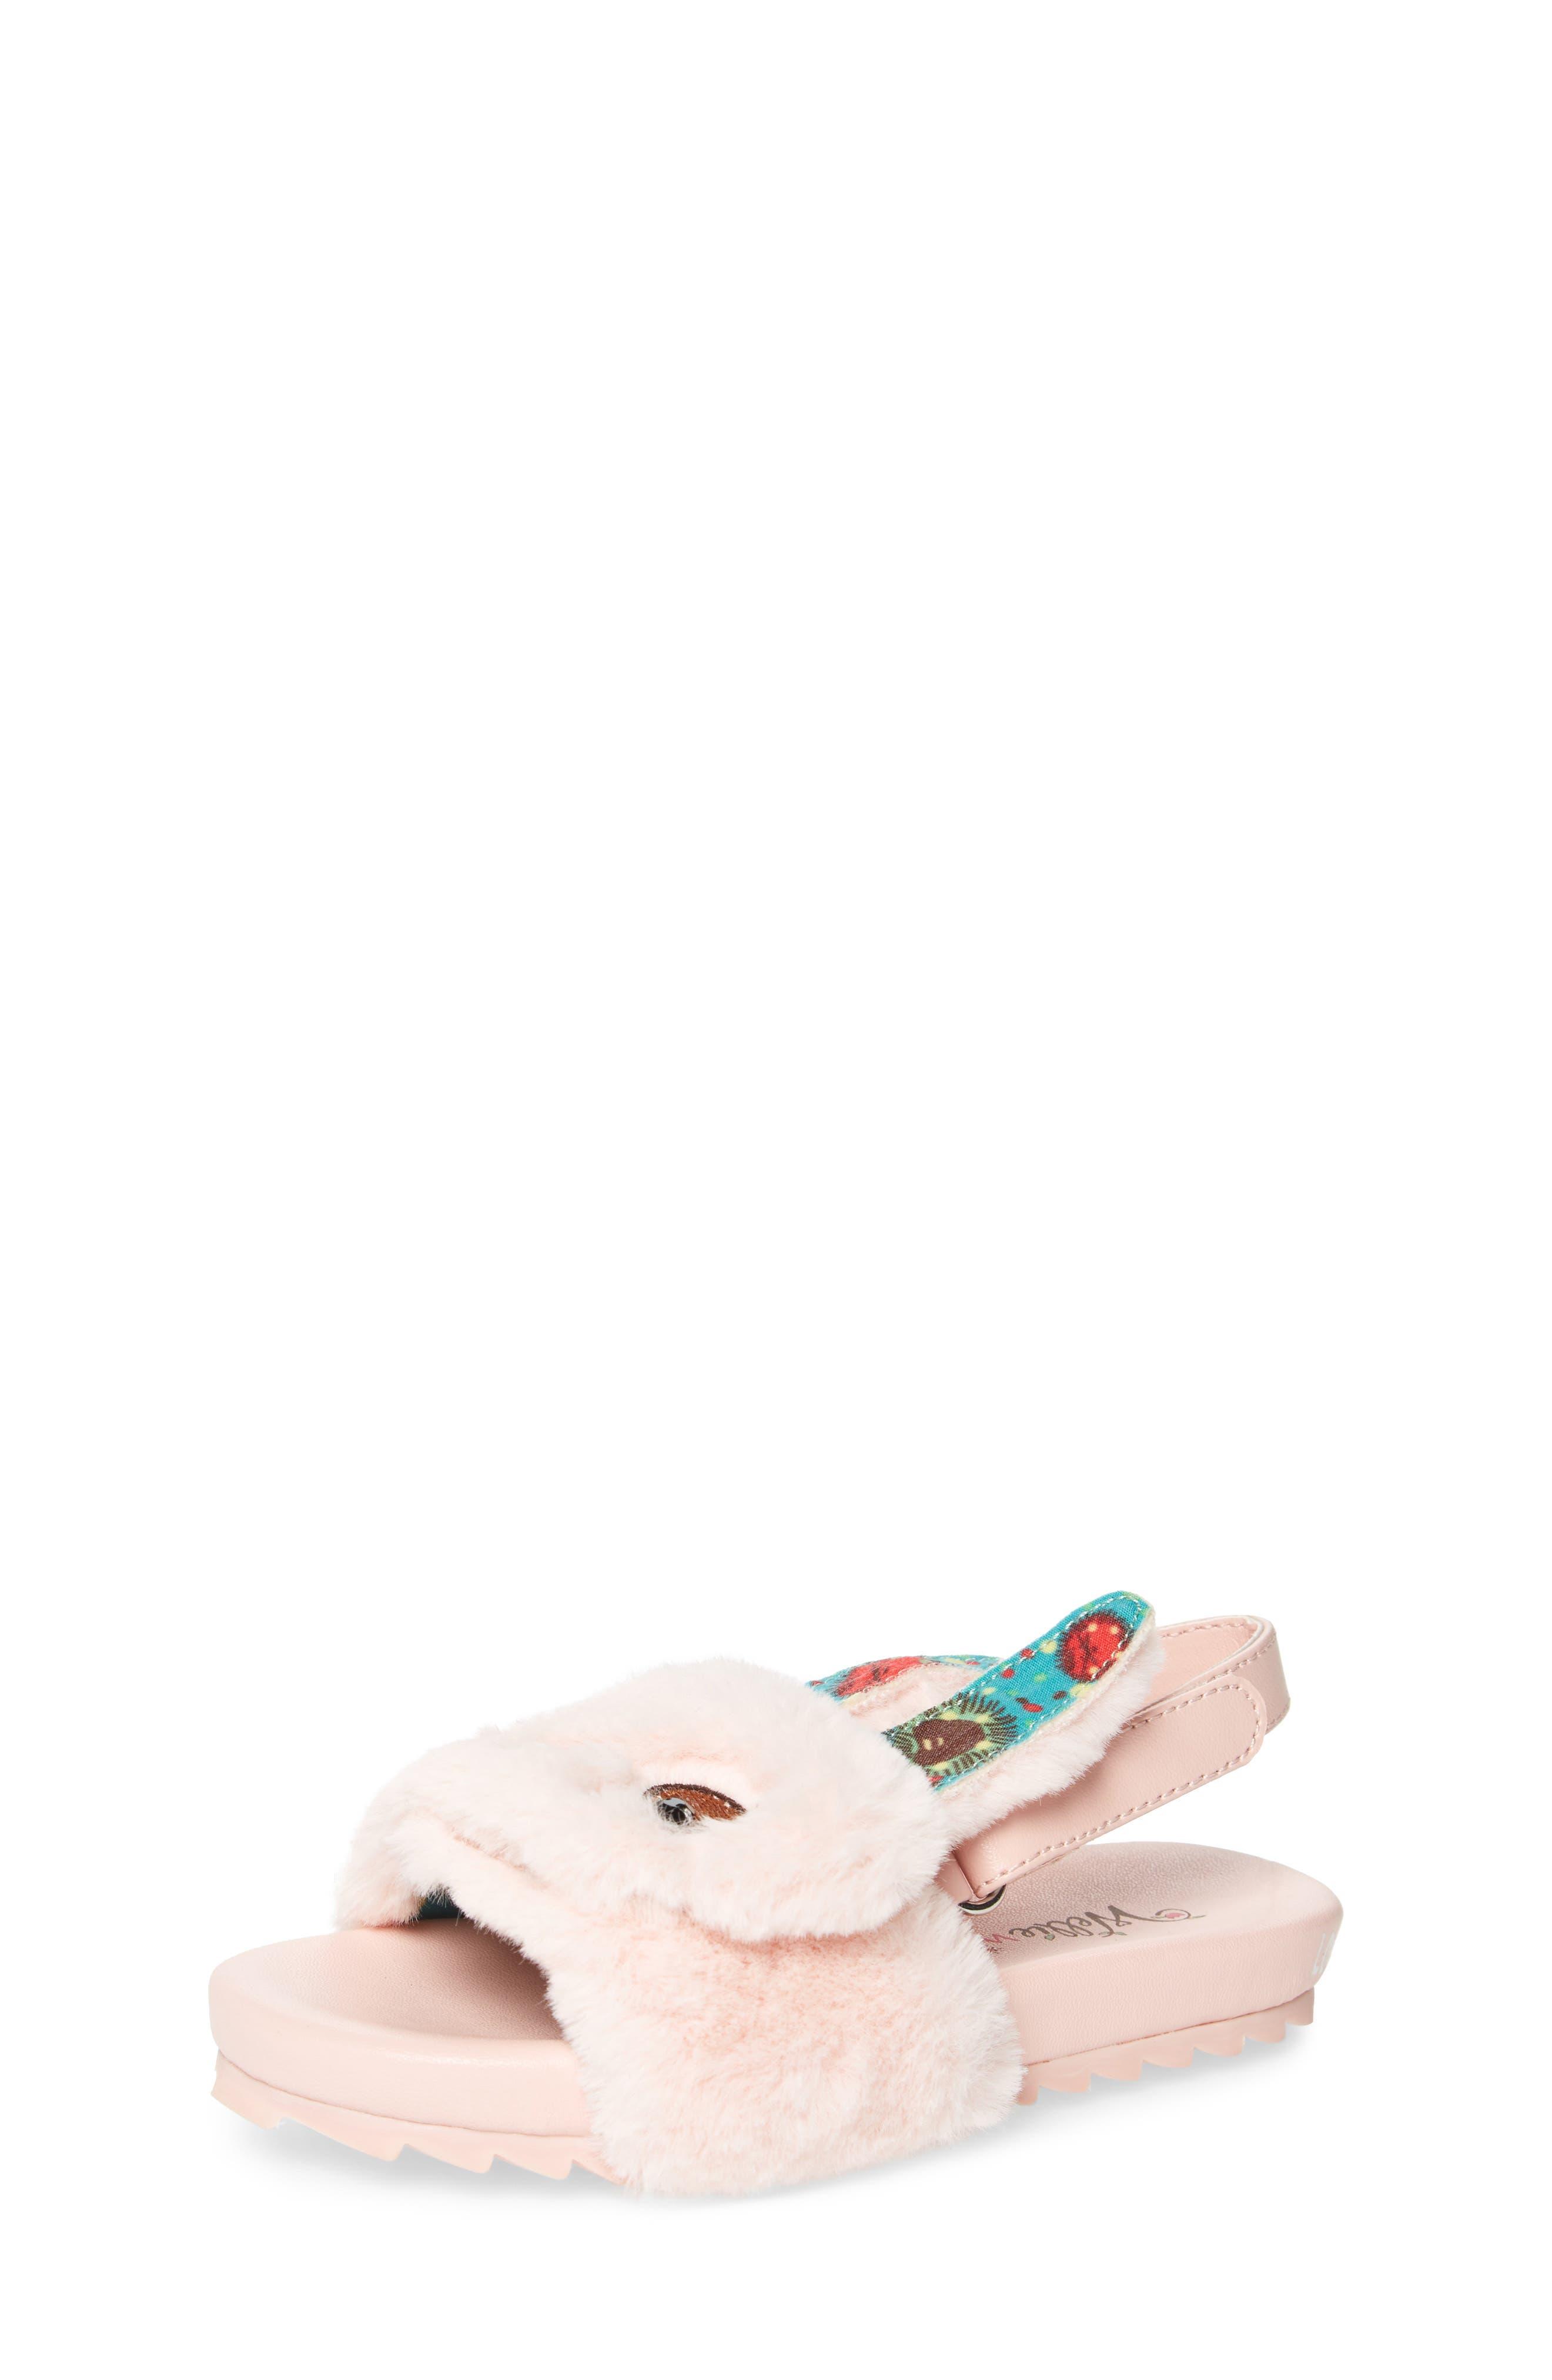 Willa Carrot Faux Fur Strap Slide Sandal,                         Main,                         color, 697